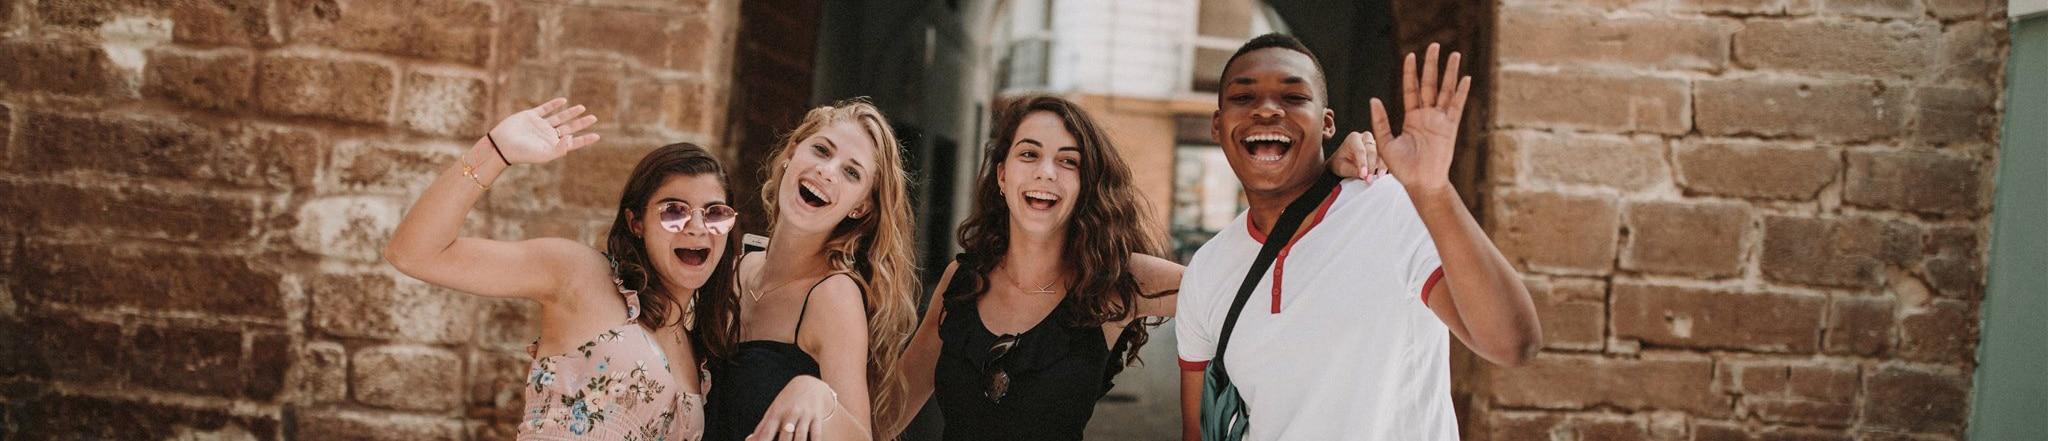 Summer volunteer abroad programs for high school students in Spain